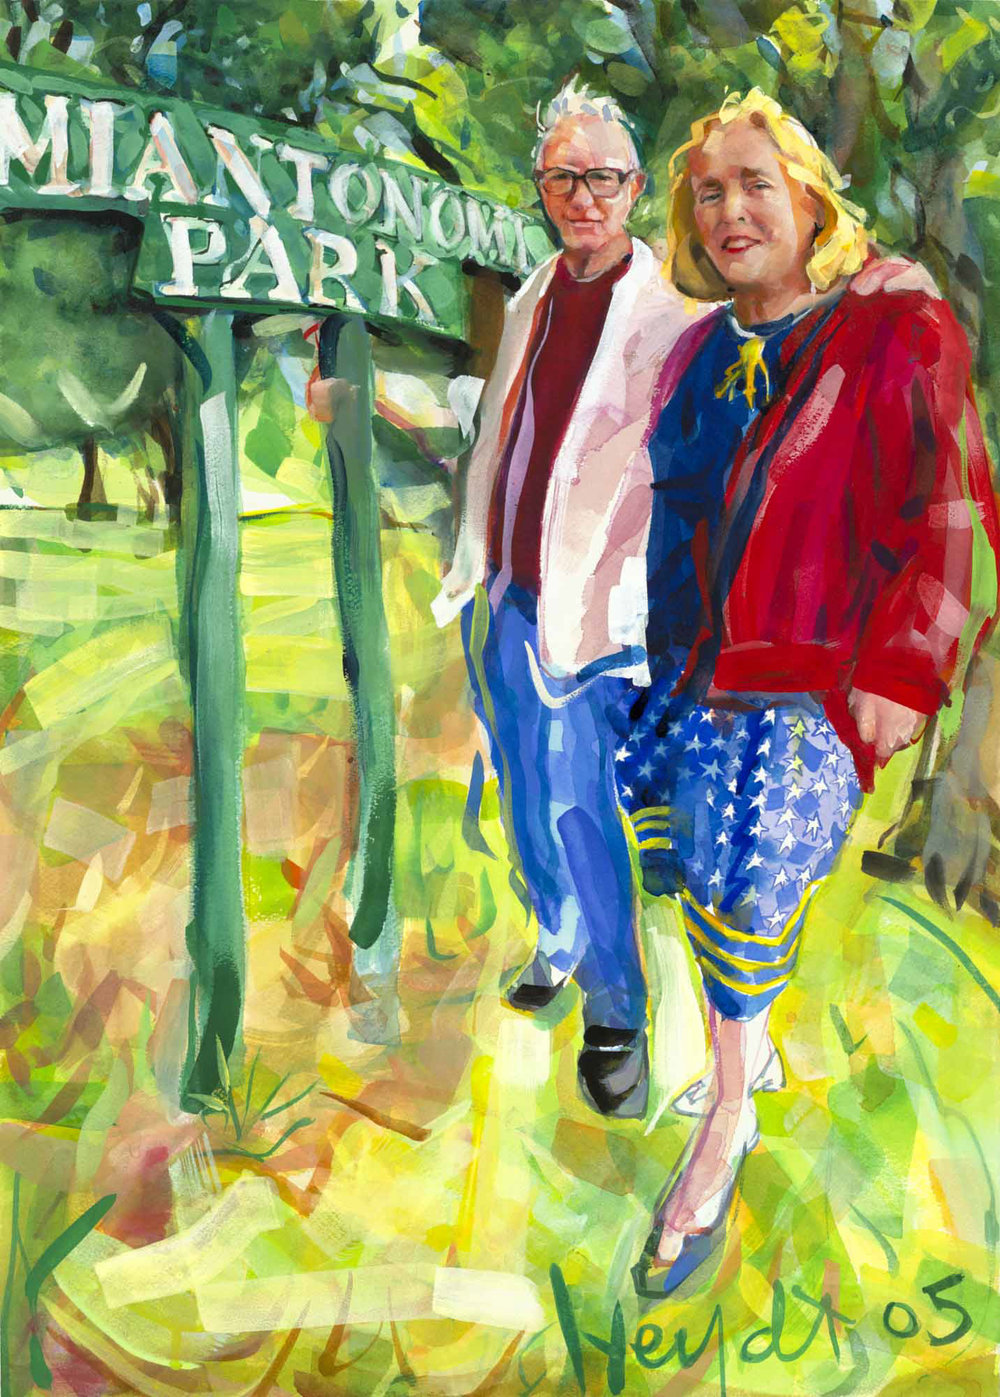 NewportantII-Miantonomi Park.jpg